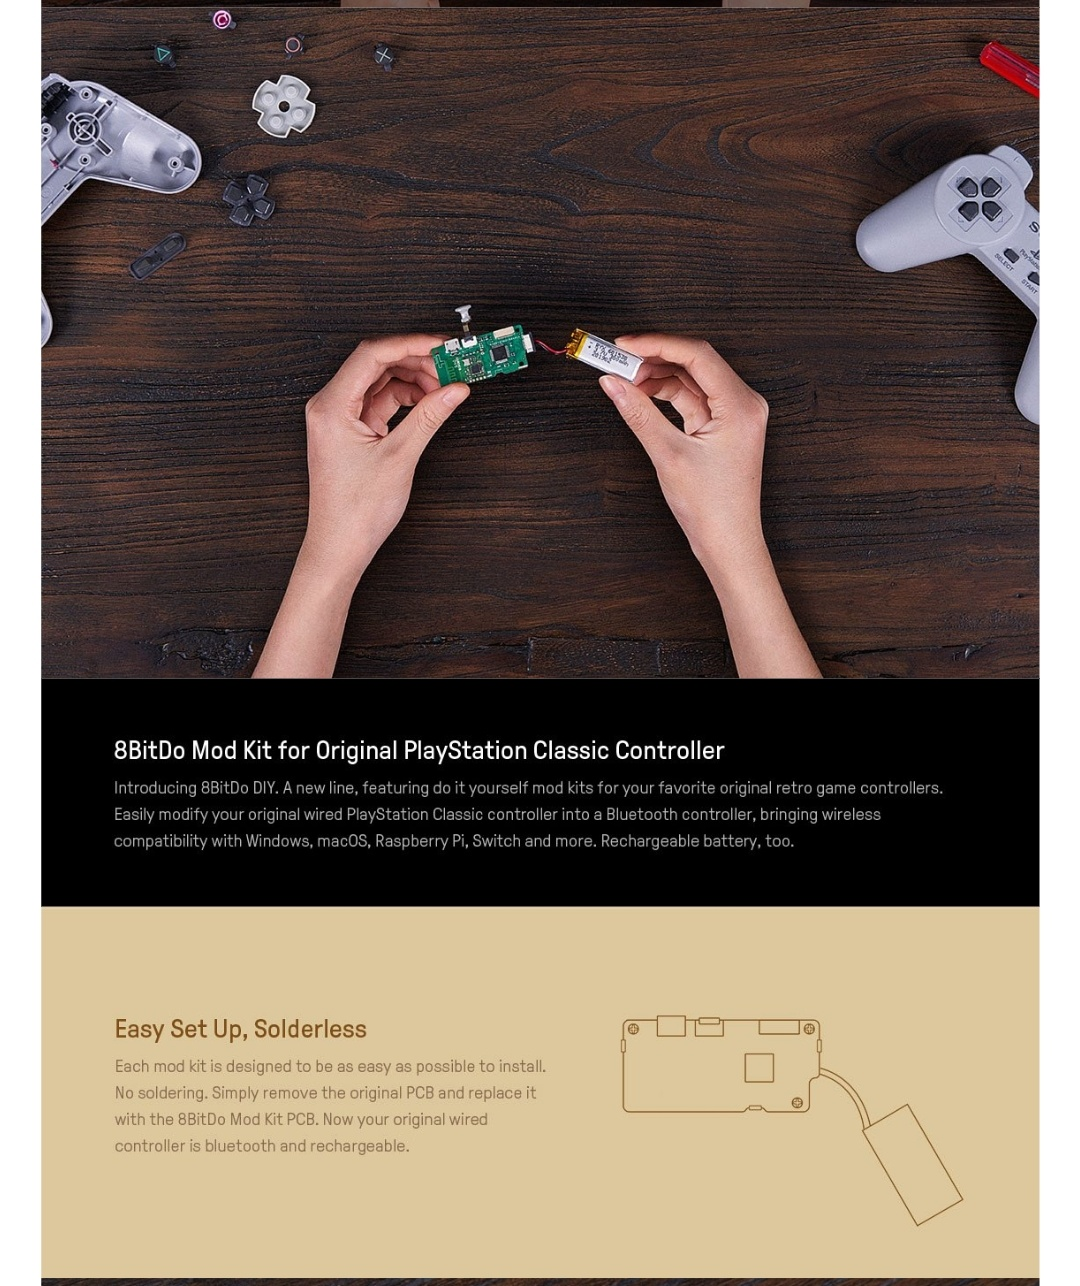 8Bitdo-Diy-Mod Kit-Playstation-Classic-Belchine-2